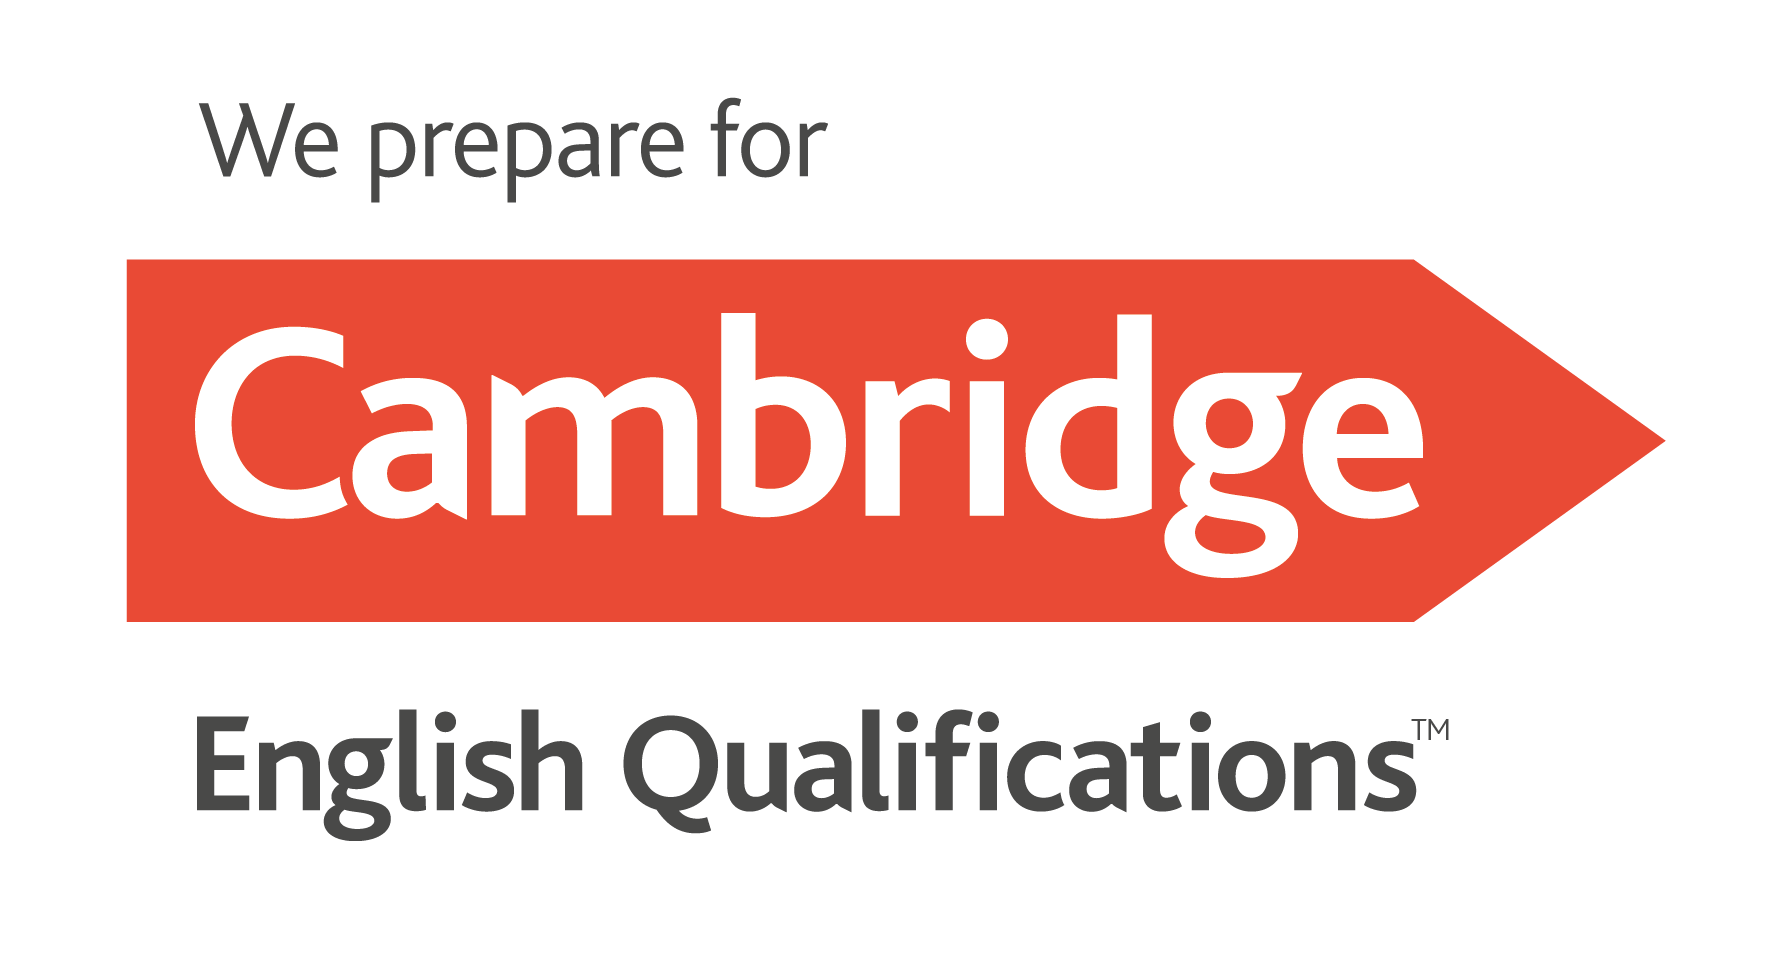 Cambridge-prep